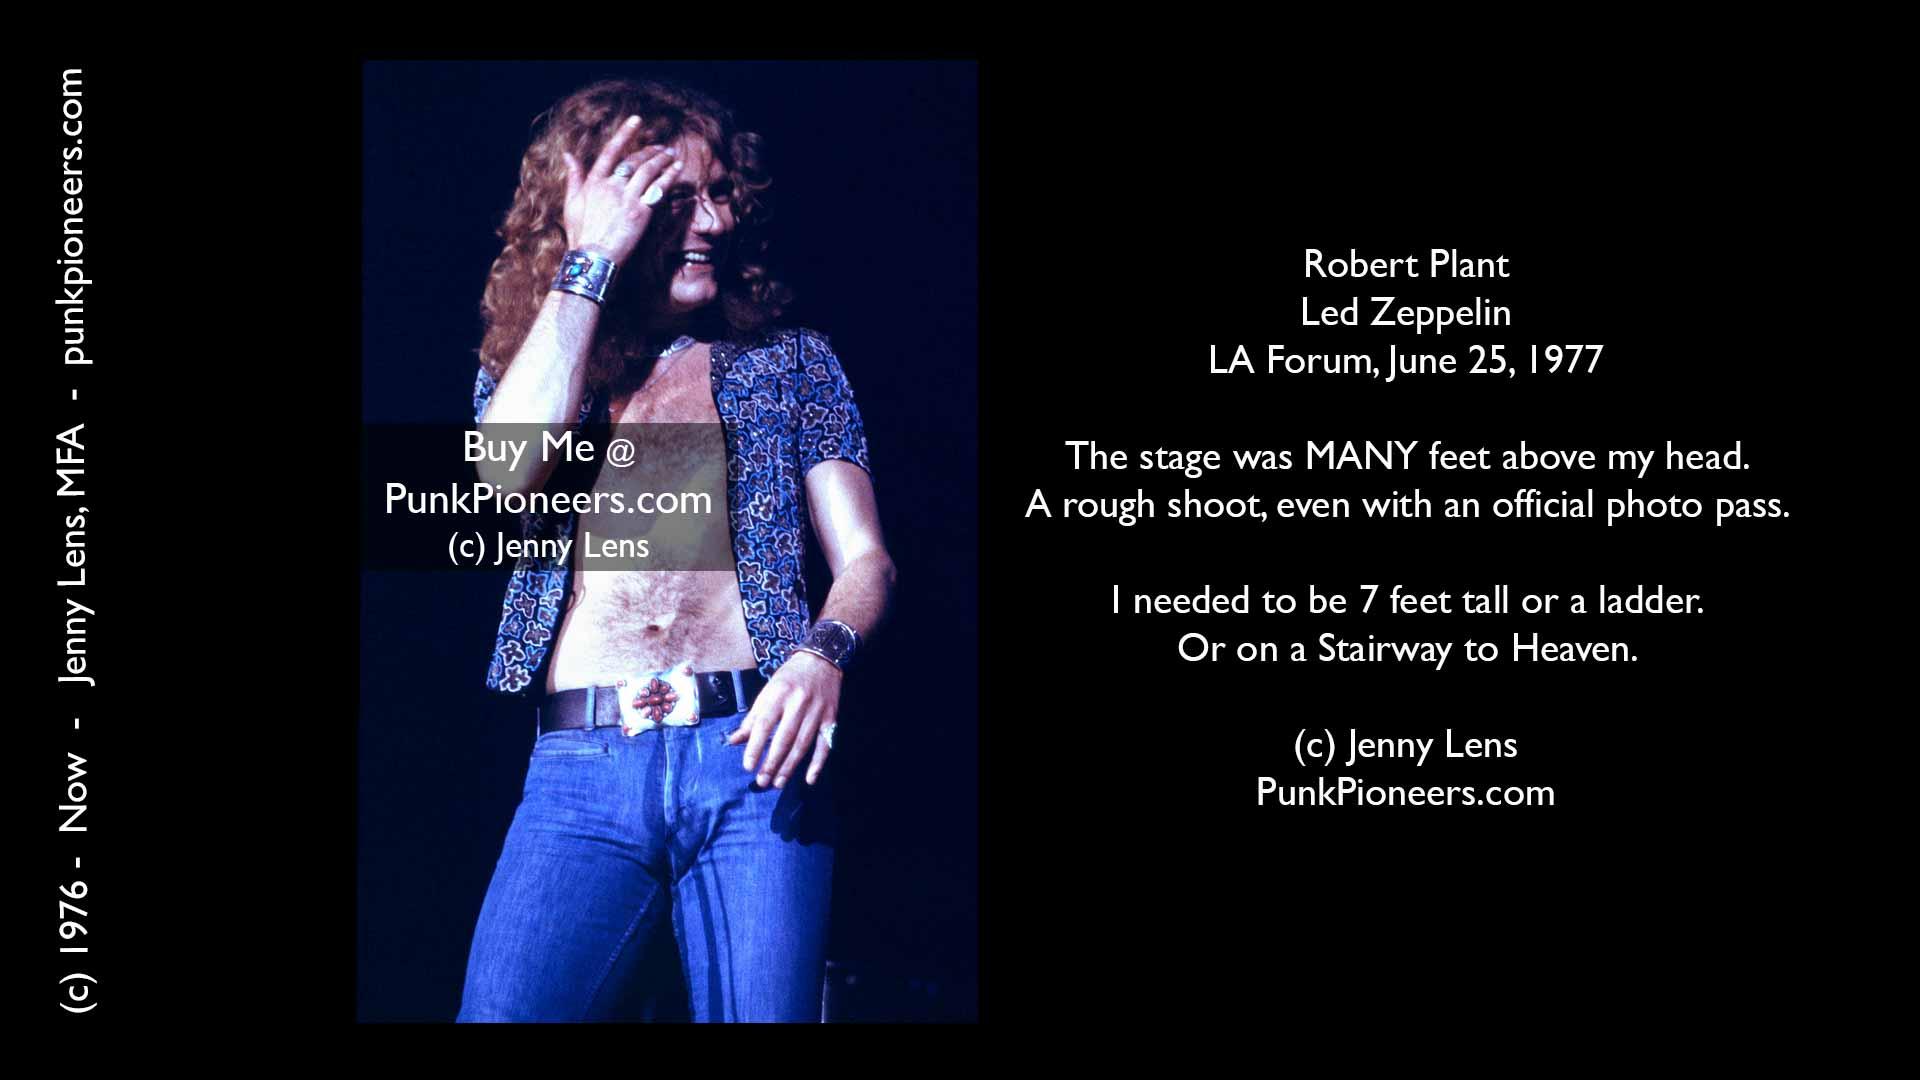 Led Zeppelin, Robert Plant, LA Forum, June 25, 1977, Jenny Lens, PunkPioneers.com